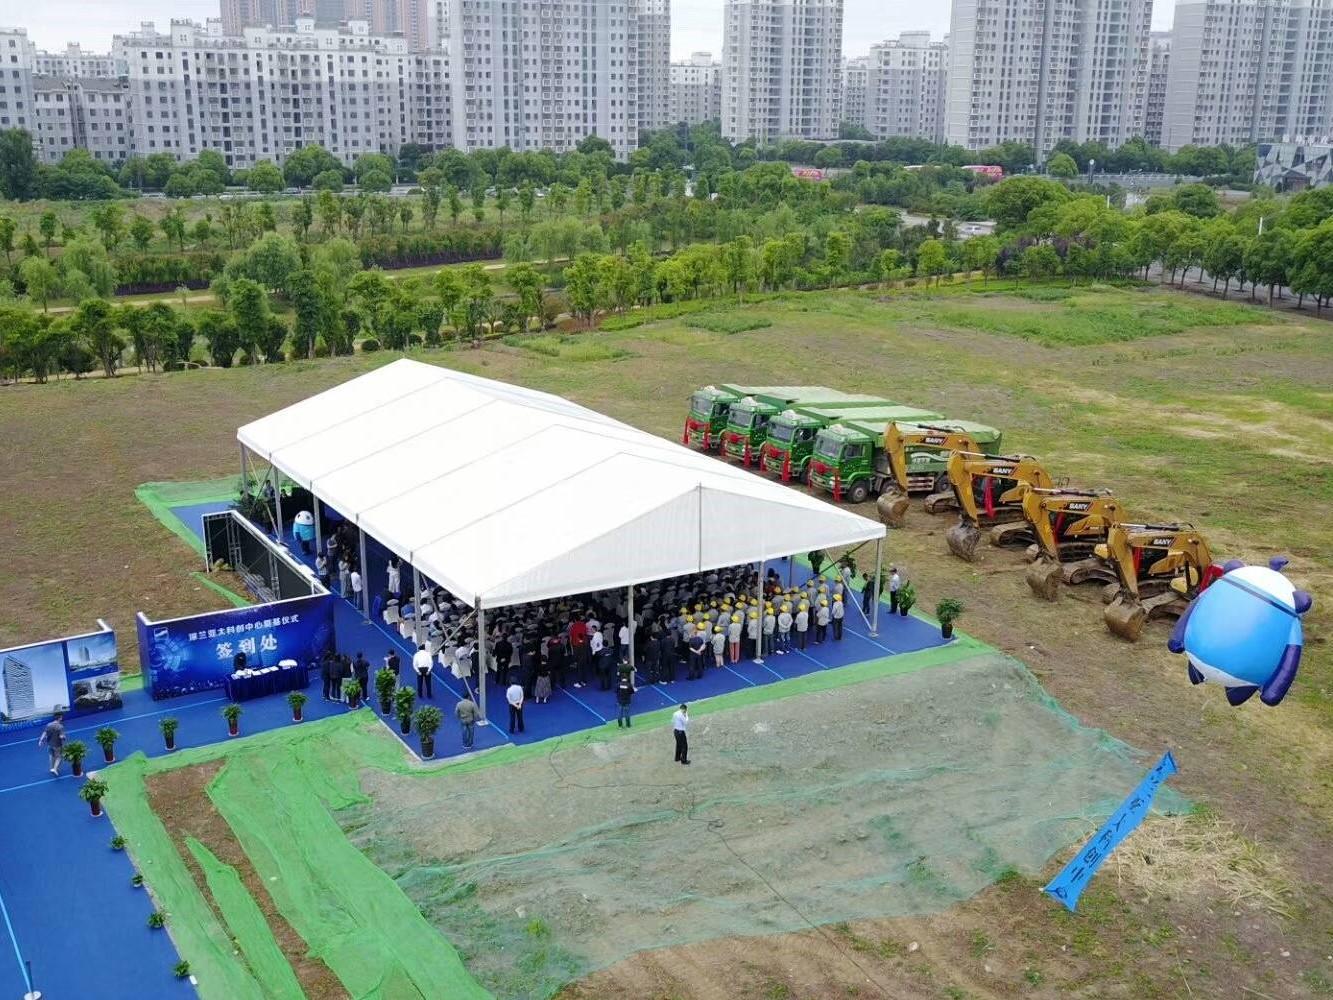 DeepBlue Technology to Build Asian R&D Center in Changzhou